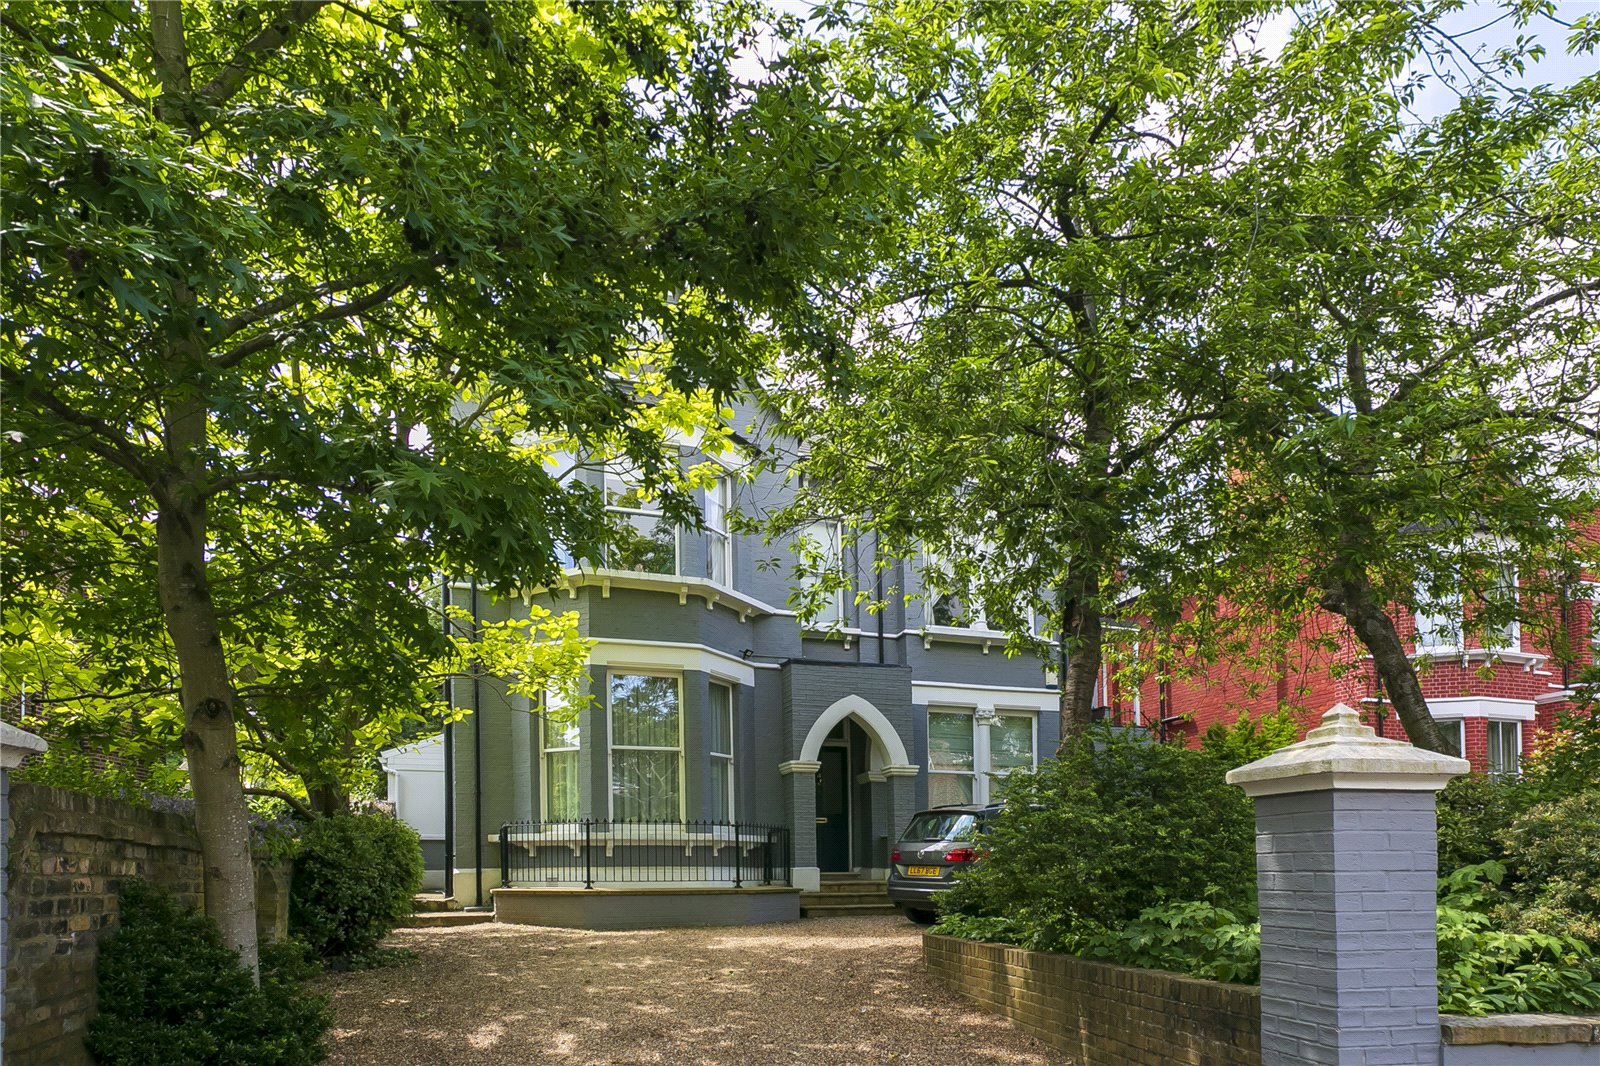 Broomfield Road, Kew, TW9 3HA - Antony Roberts